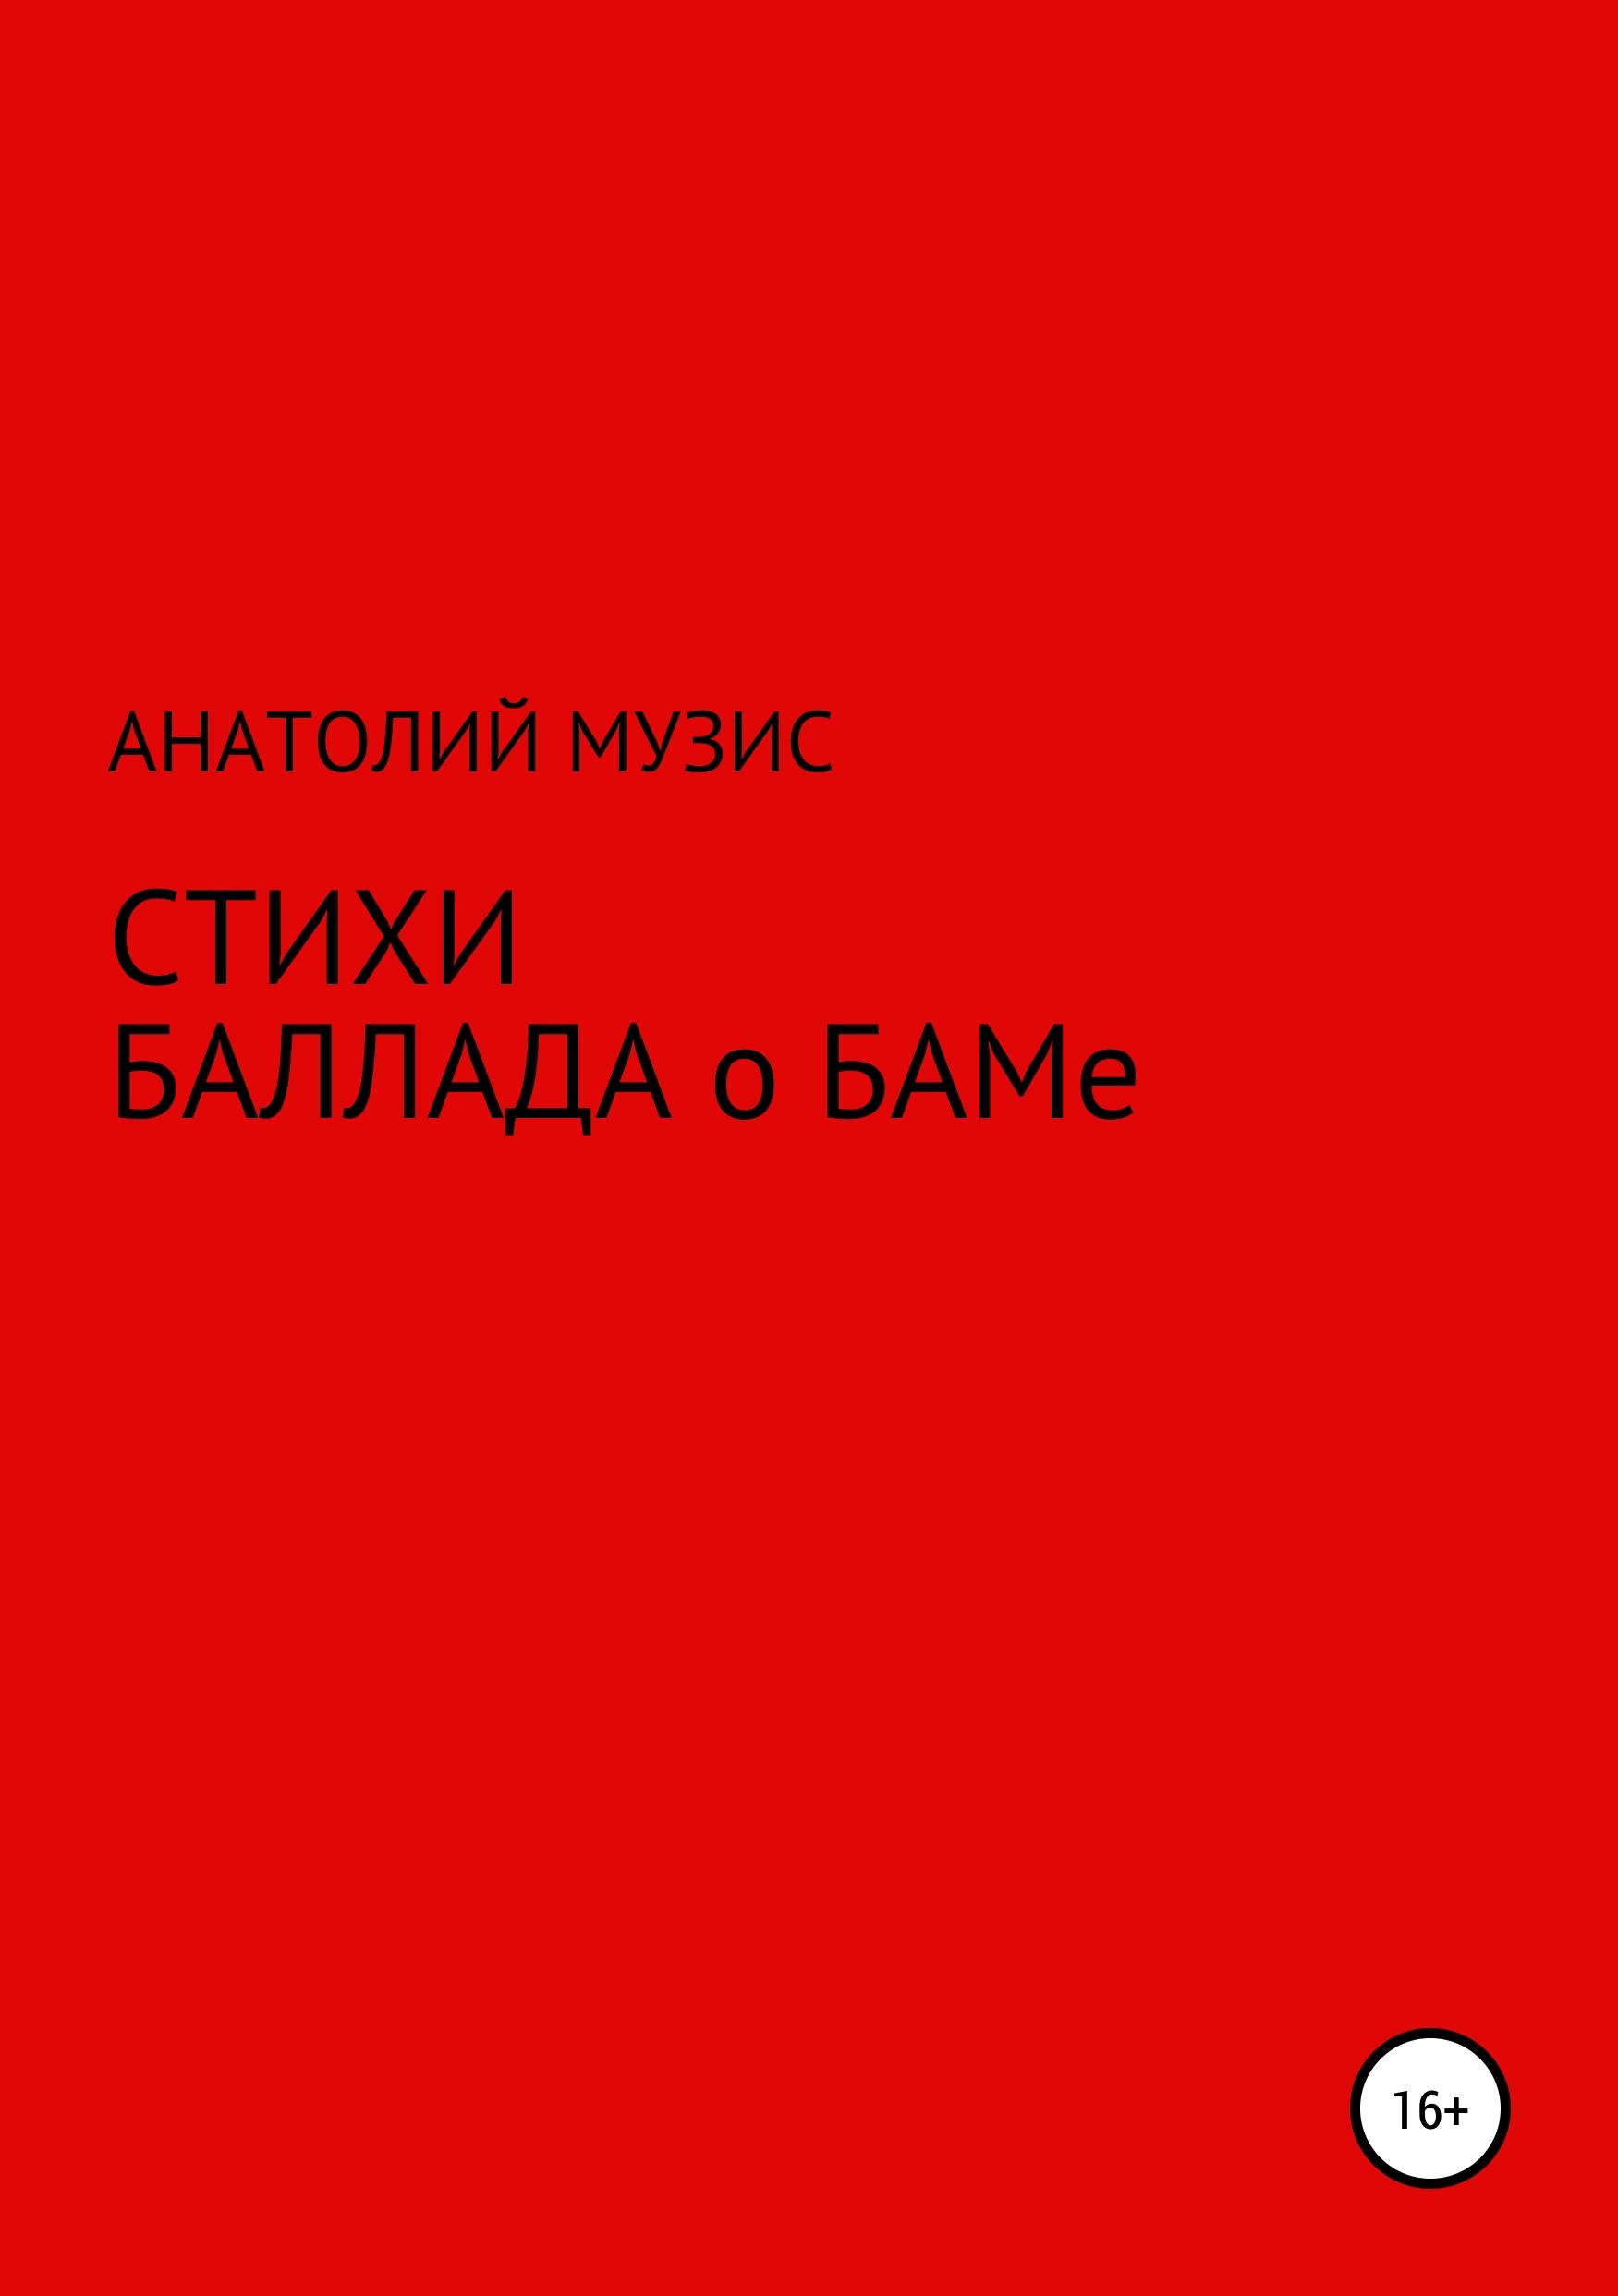 Книга Стихи. Баллада о БАМе, автор: Анатолий Музис